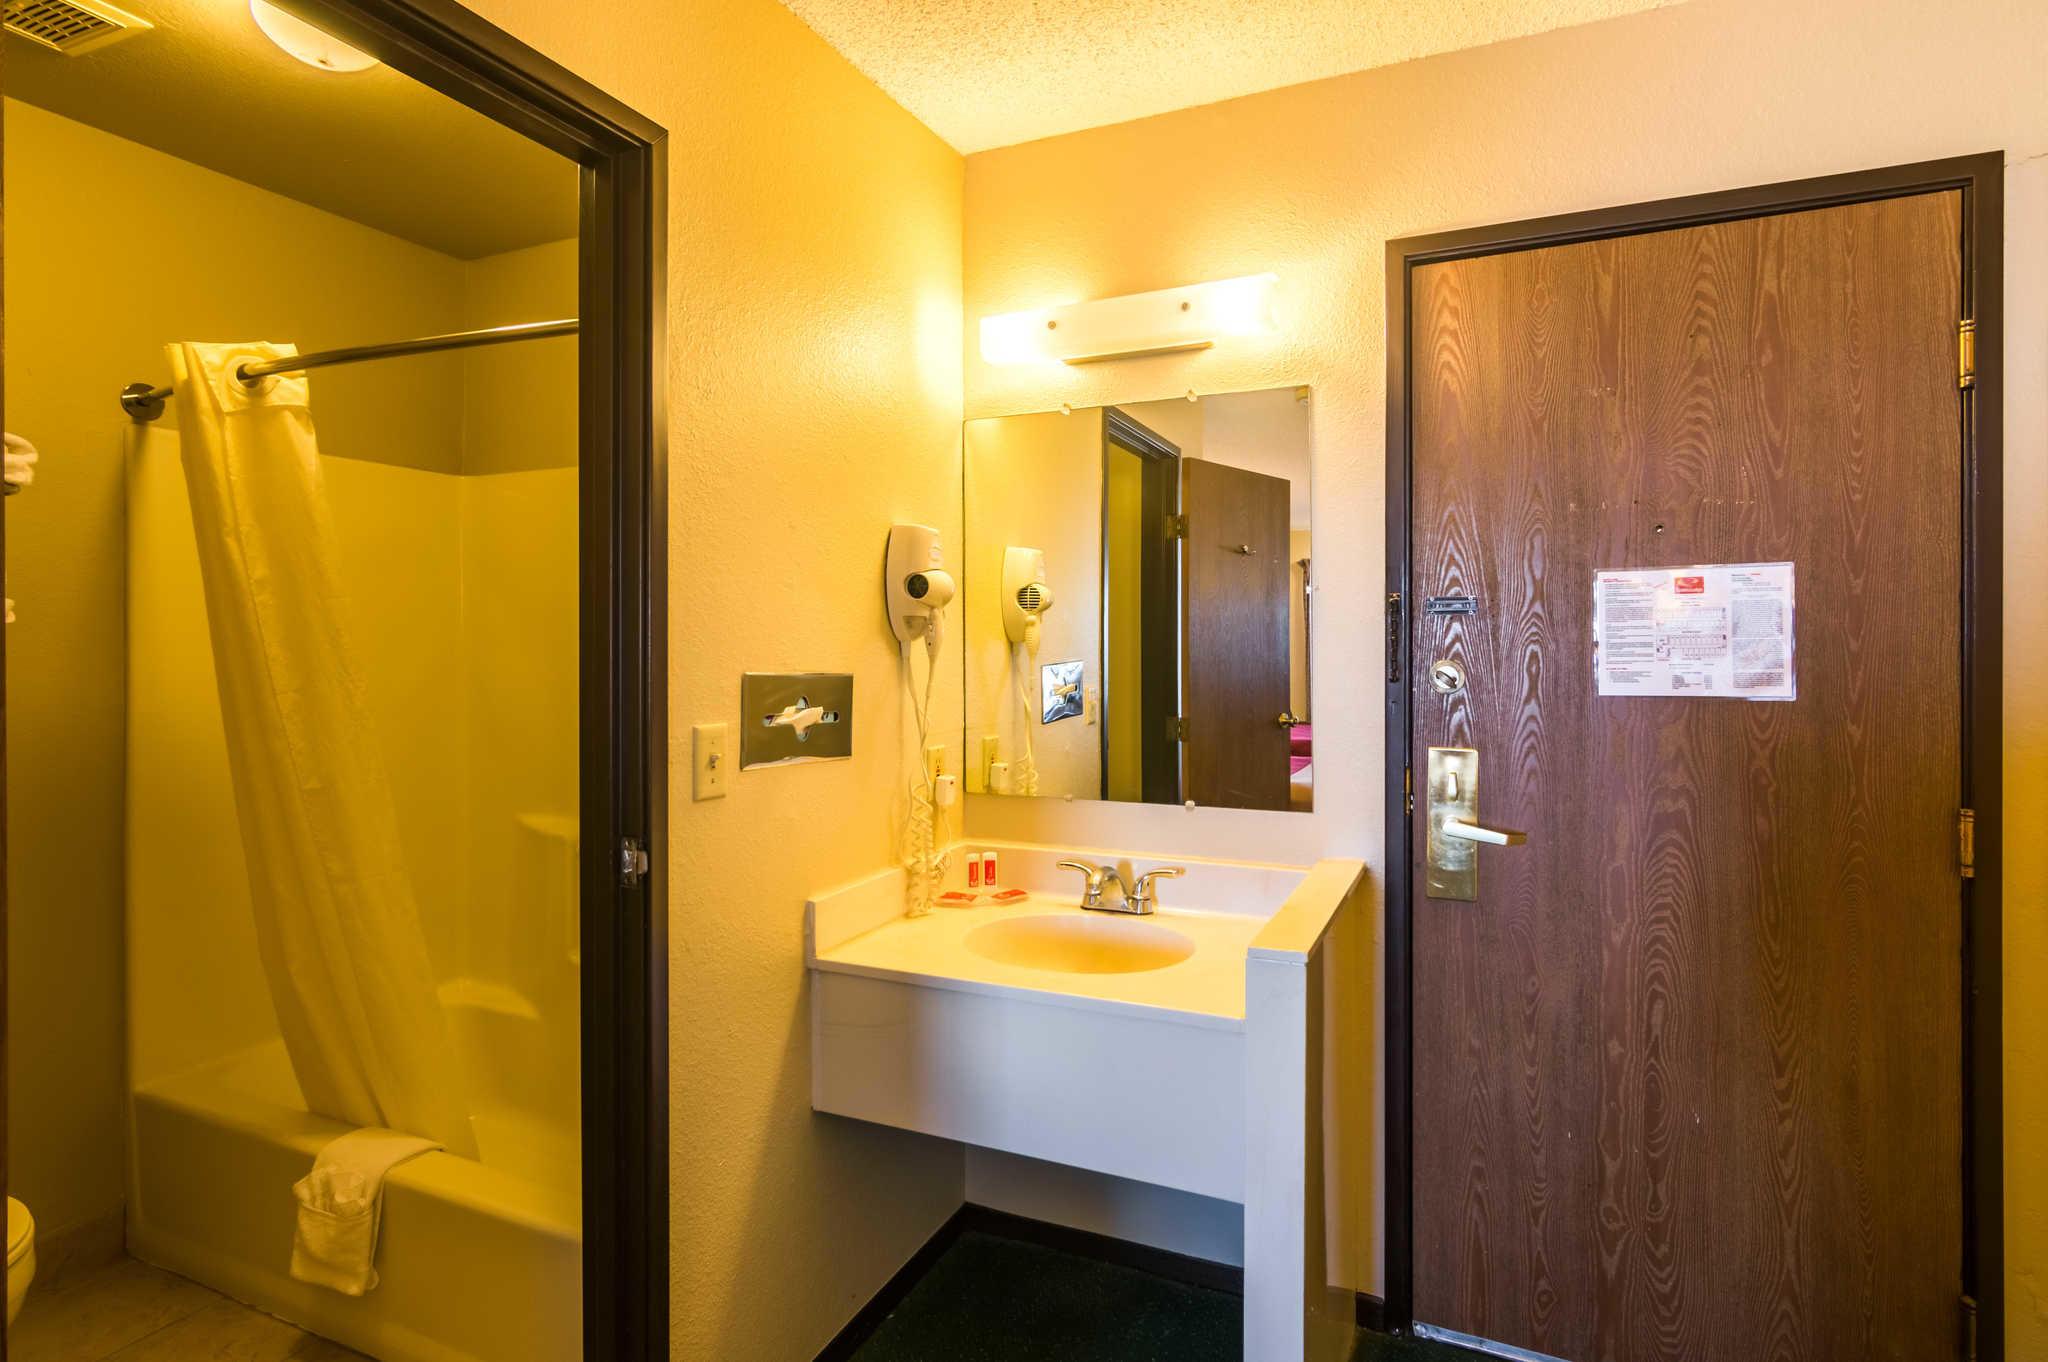 Econo Lodge image 9